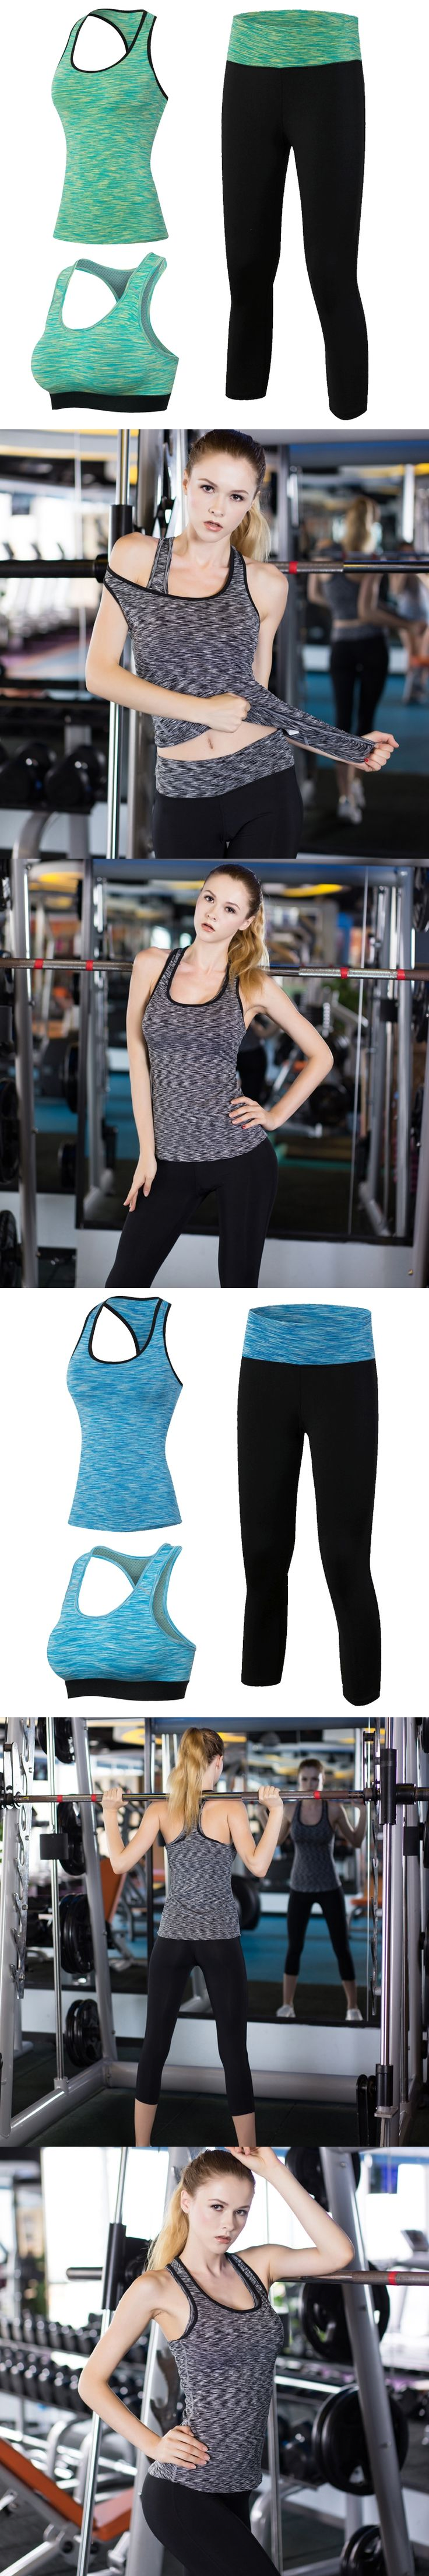 New 3pcs Sport Fitness Suit Women Yoga Sets Sleeveless Shirt Leggings Fitness Gym Running Sport Tights Vest and Pants Yoga set